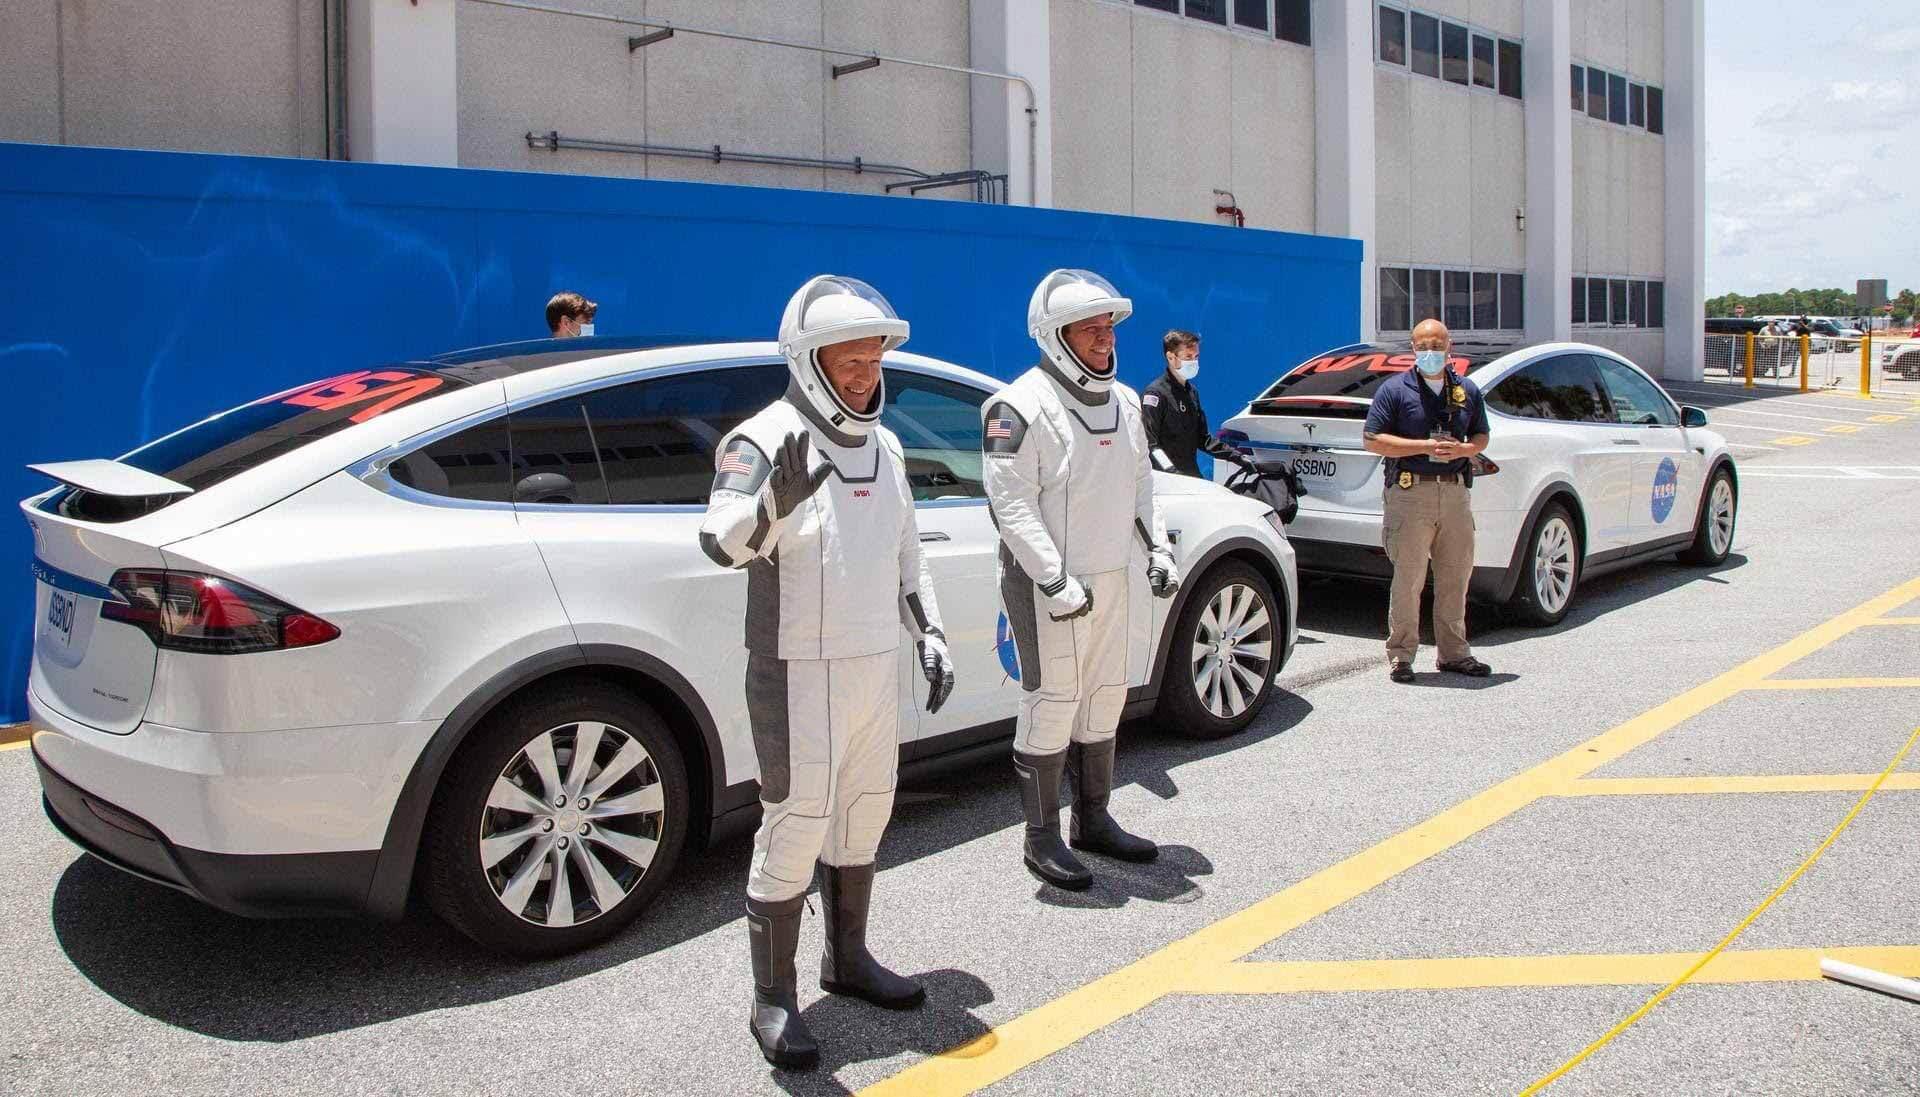 SpaceX и NASA завершают одну генеральную репетицию перед историческим запуском